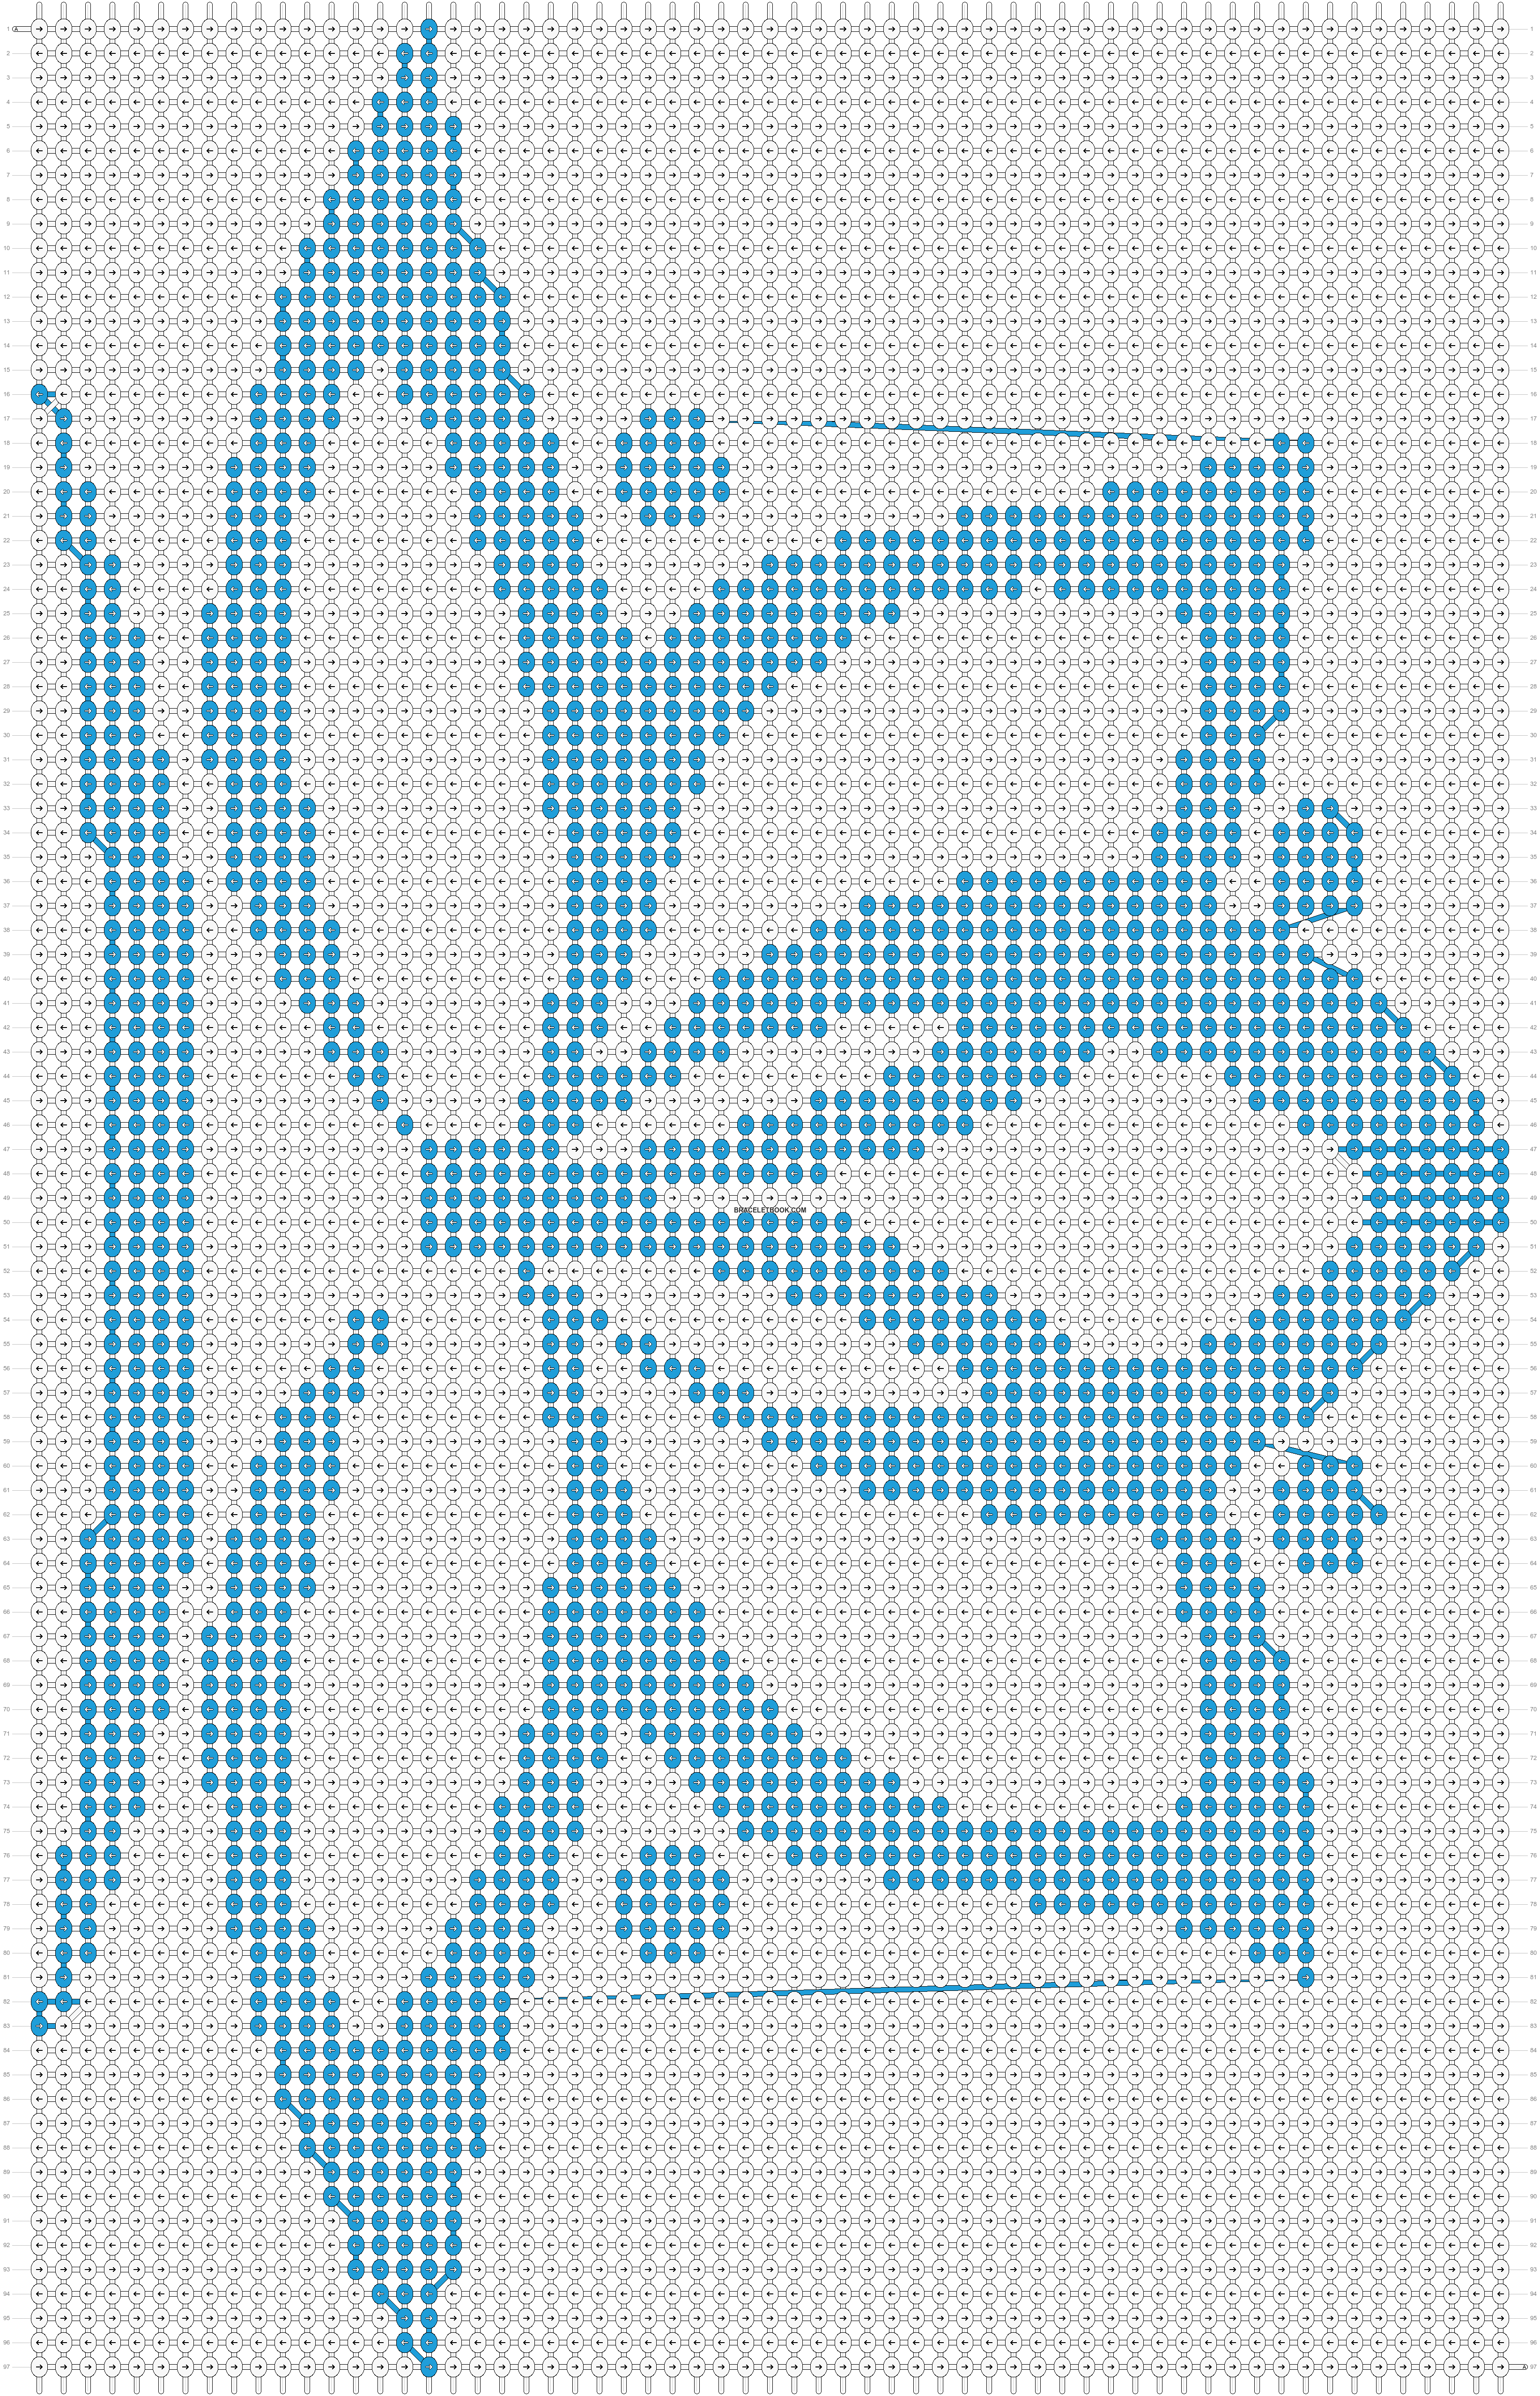 Alpha Pattern #21715 added by seen